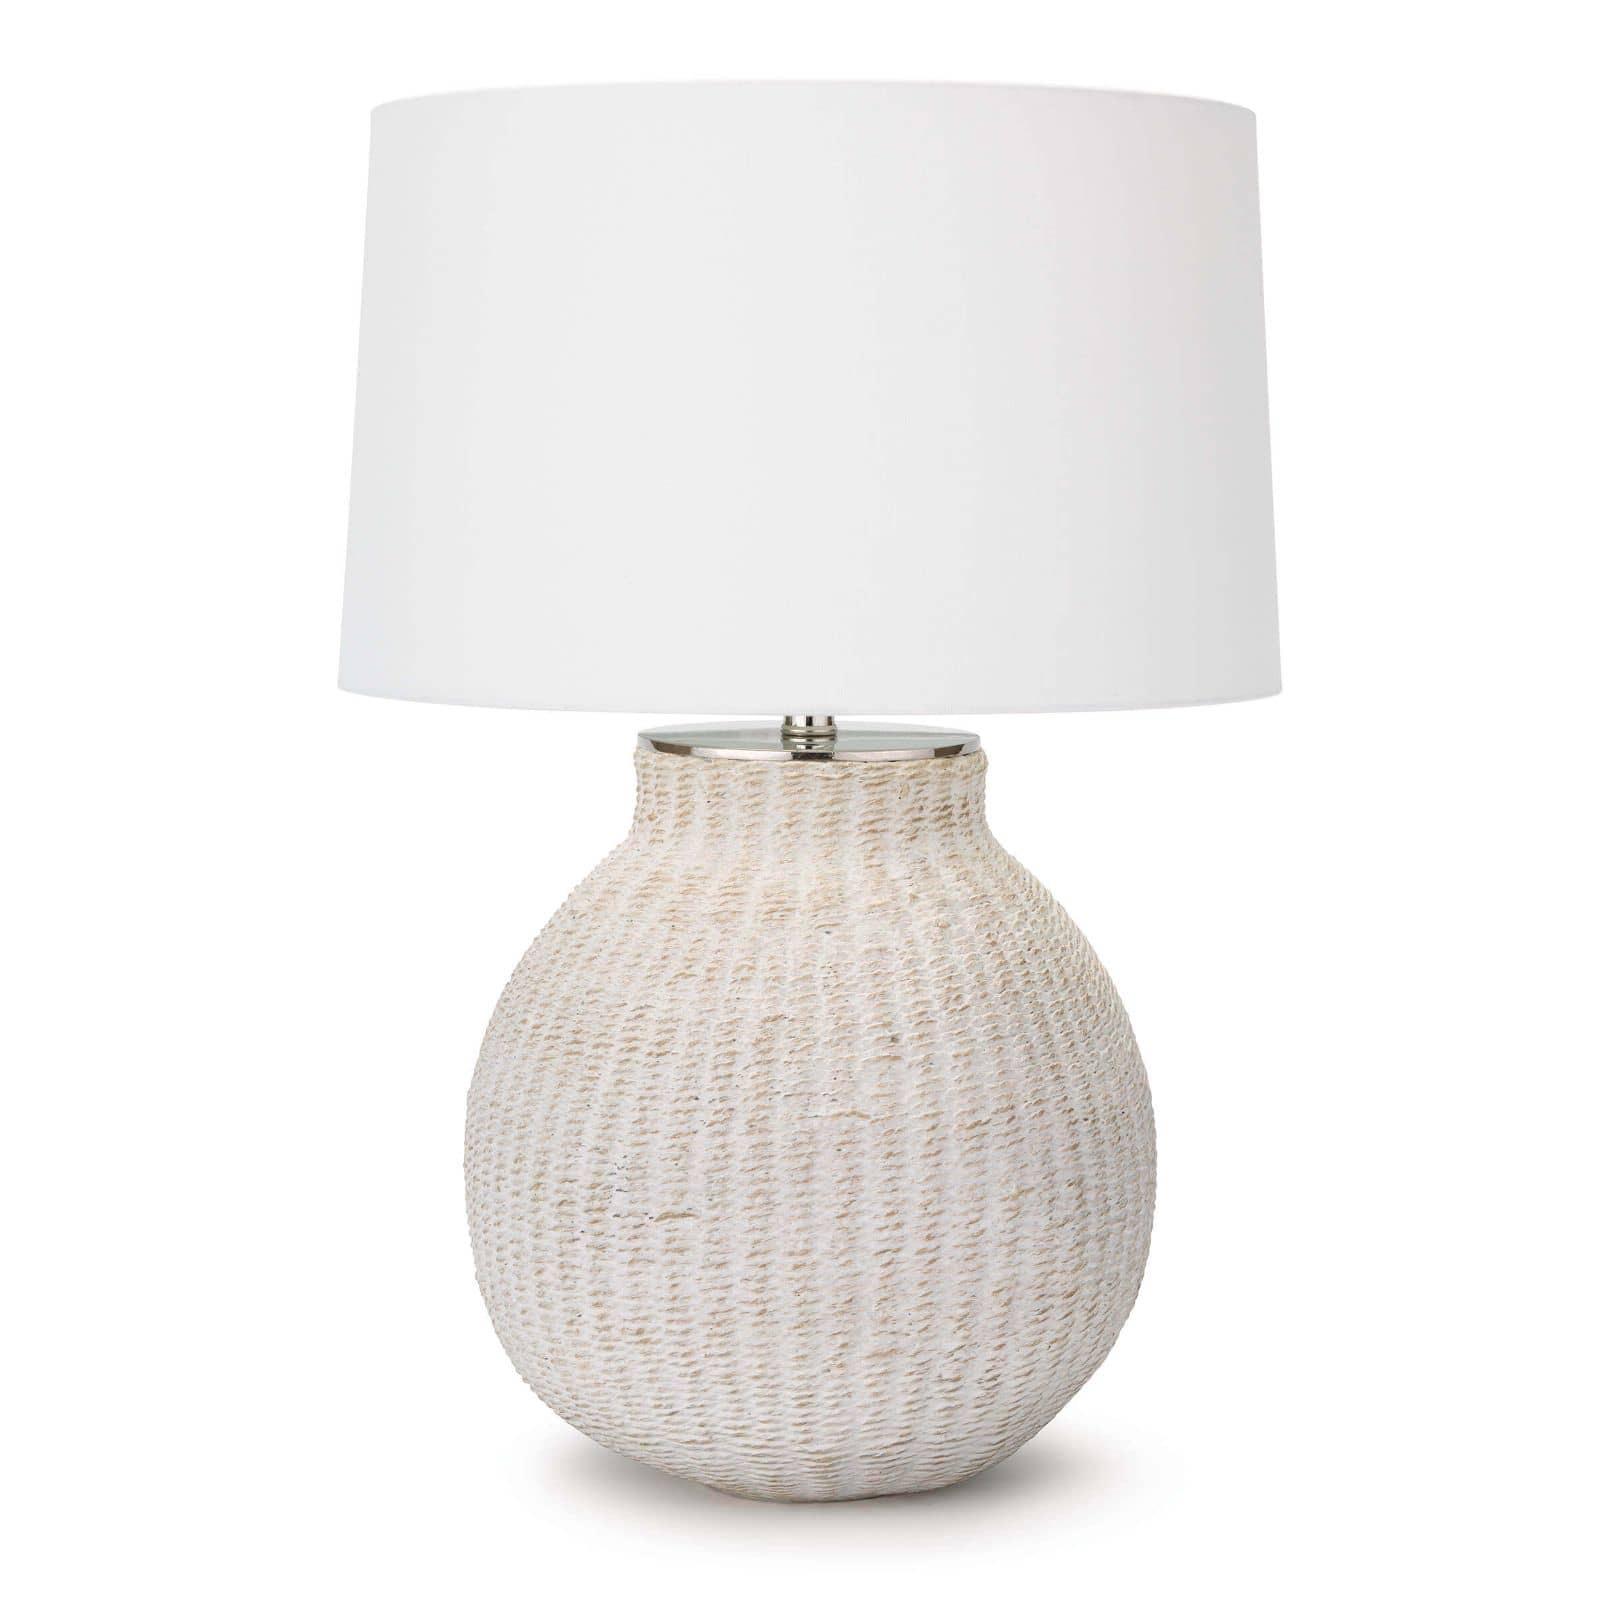 Bali Table Lamp-$475.00